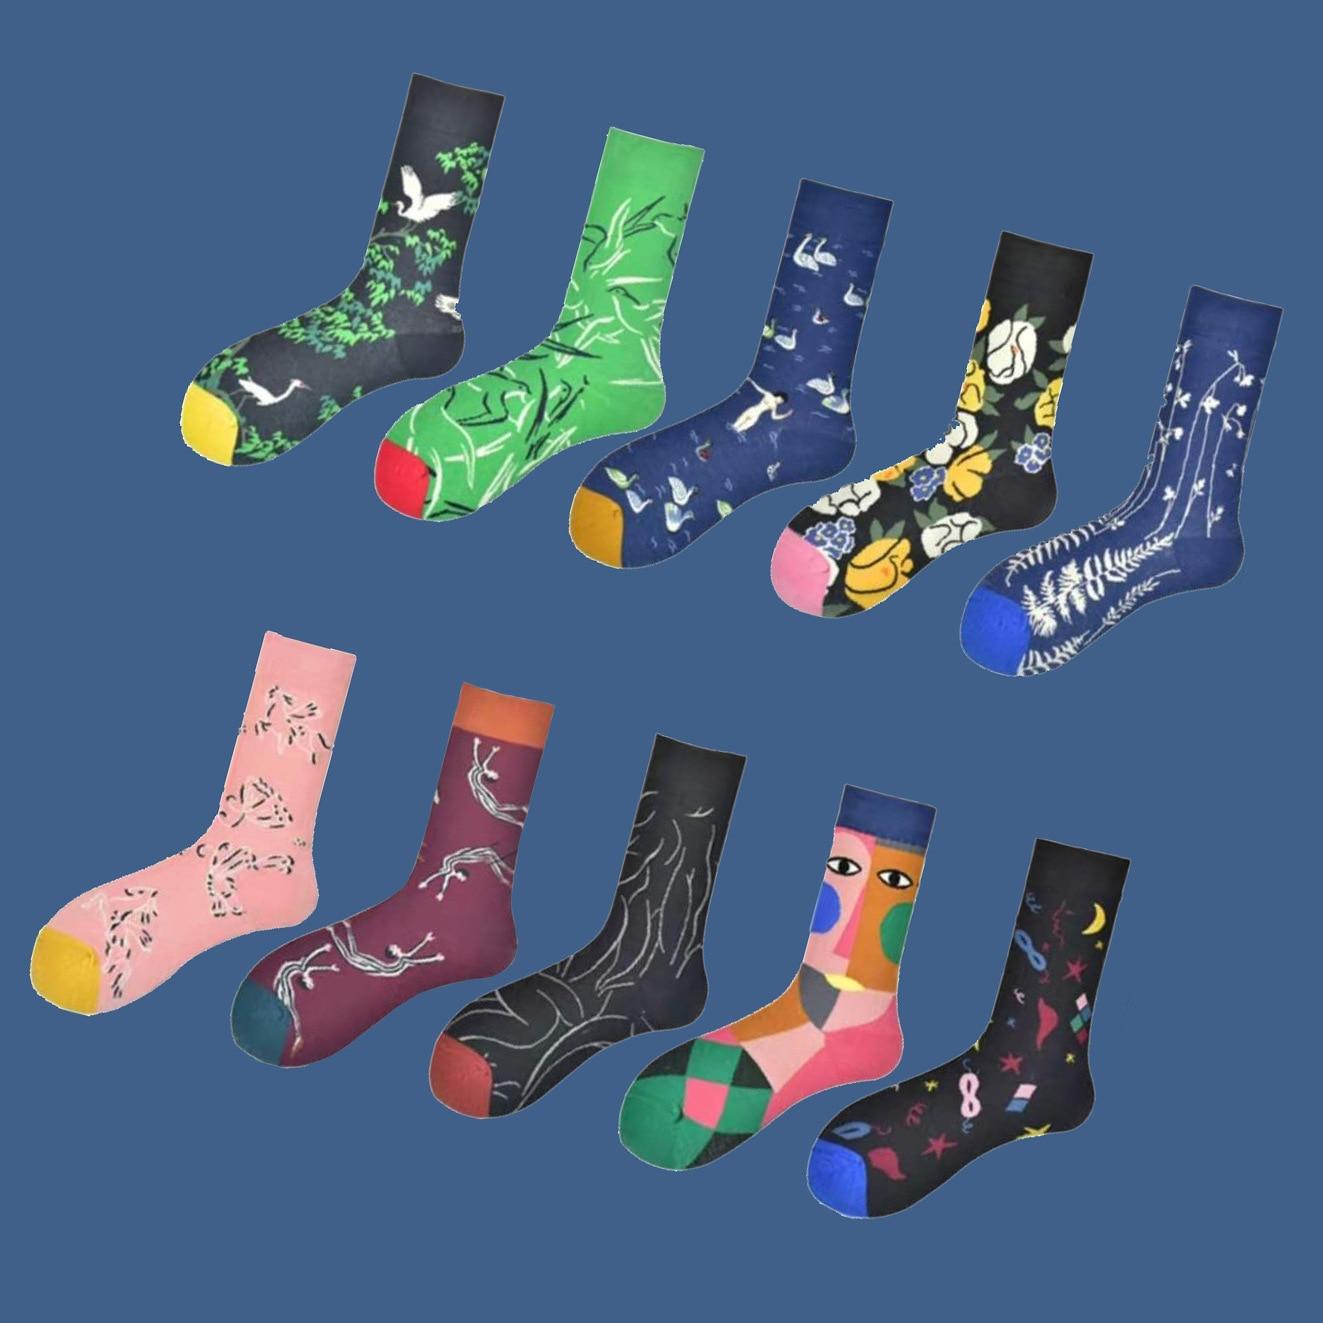 1 Pair Crew Socks Mid Length Unisex Funny Cute Socks Gift Casual Street Wear Creative Cartoon Socks Funny Painting Socks Sweet